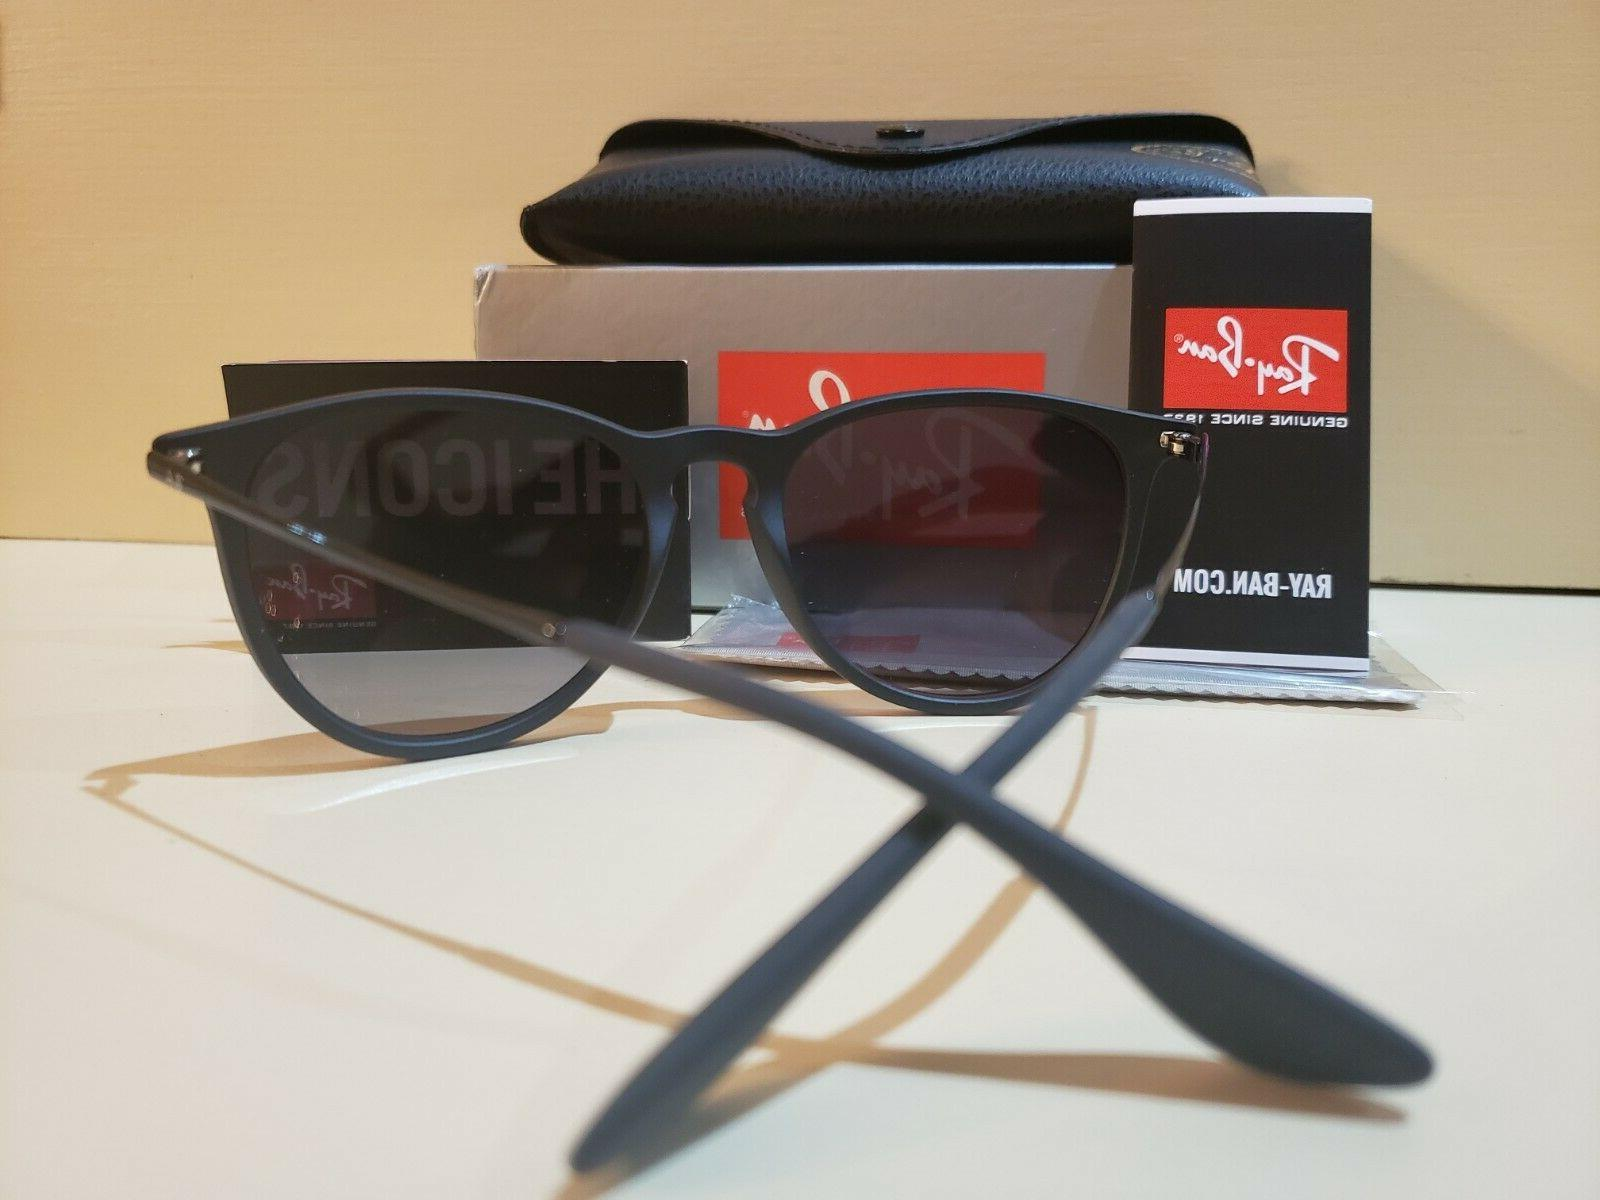 Ray-Ban Erika Classic Polarized Matte Black Sunglasses RB4171